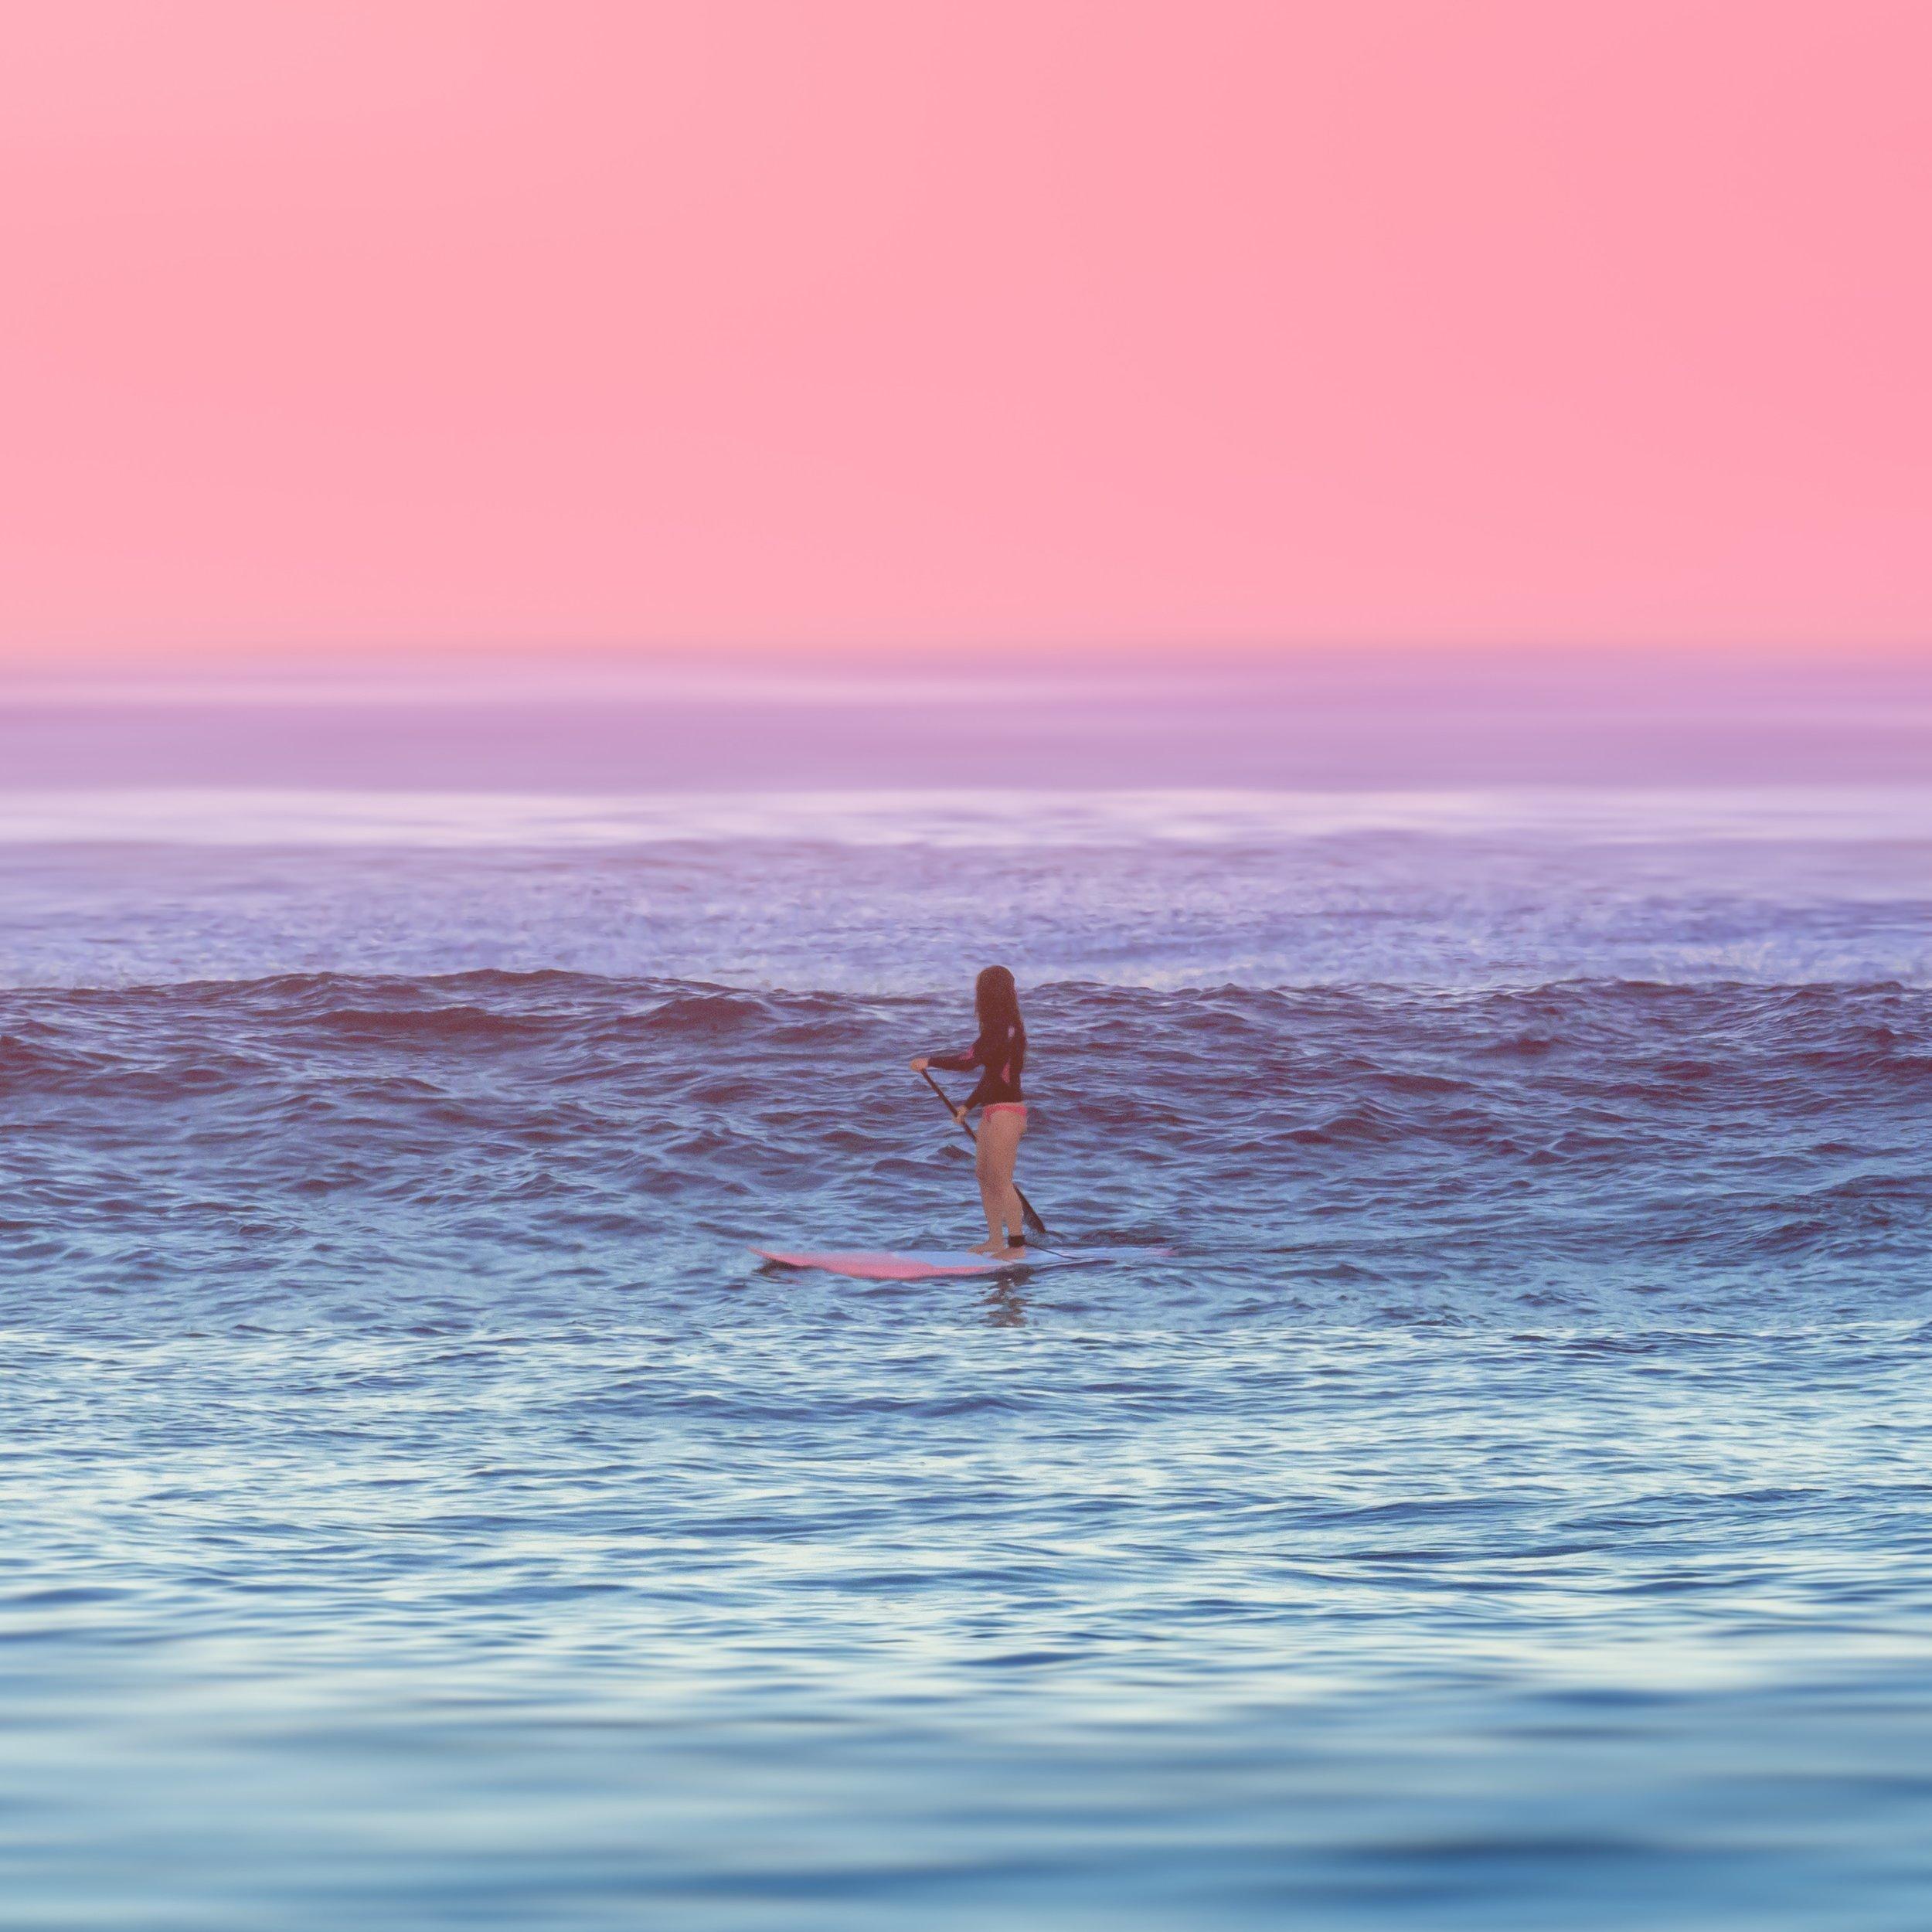 clases de surf Fuerteventura. Cursos de surf para princpiantes